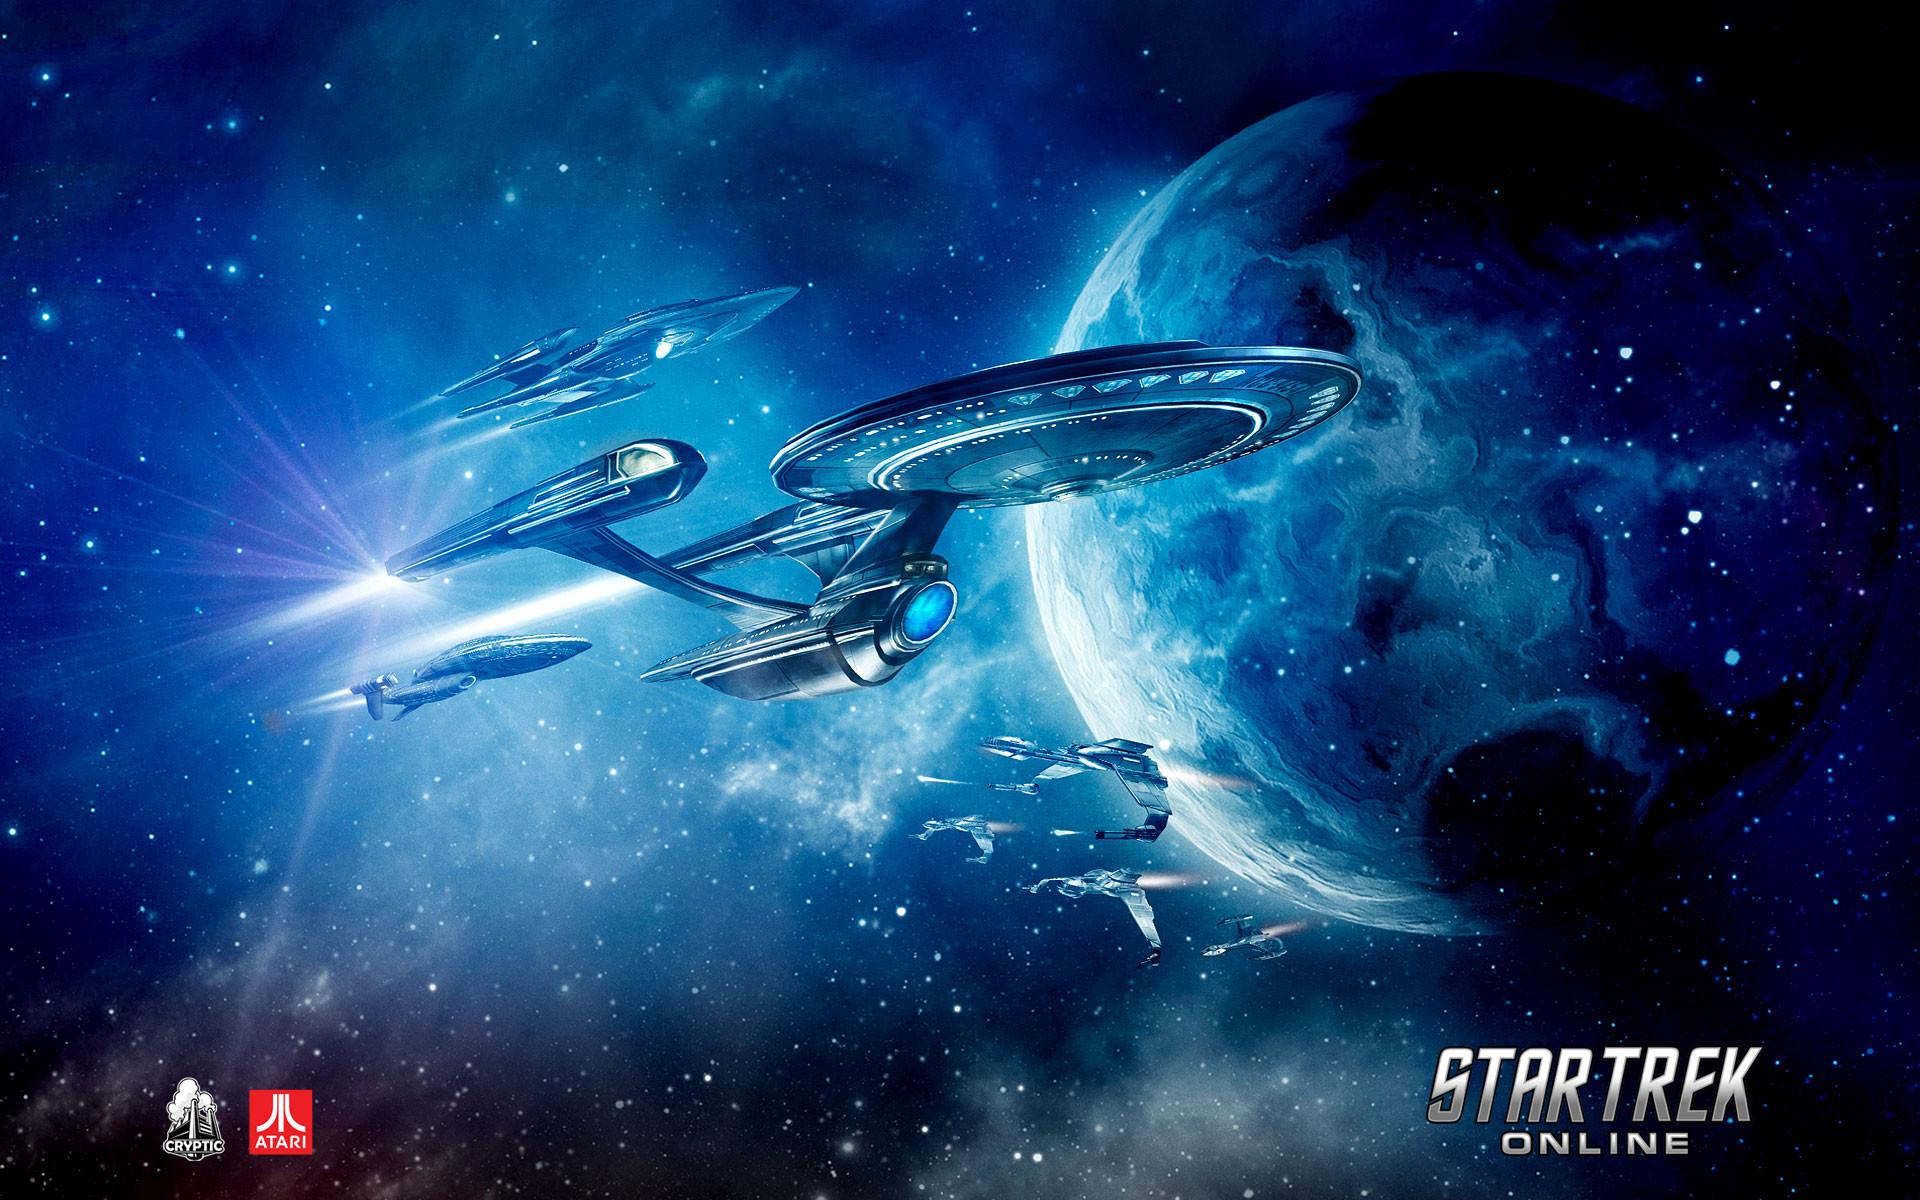 Star Trek wallpaper jpg x desktop wallpaper 22715